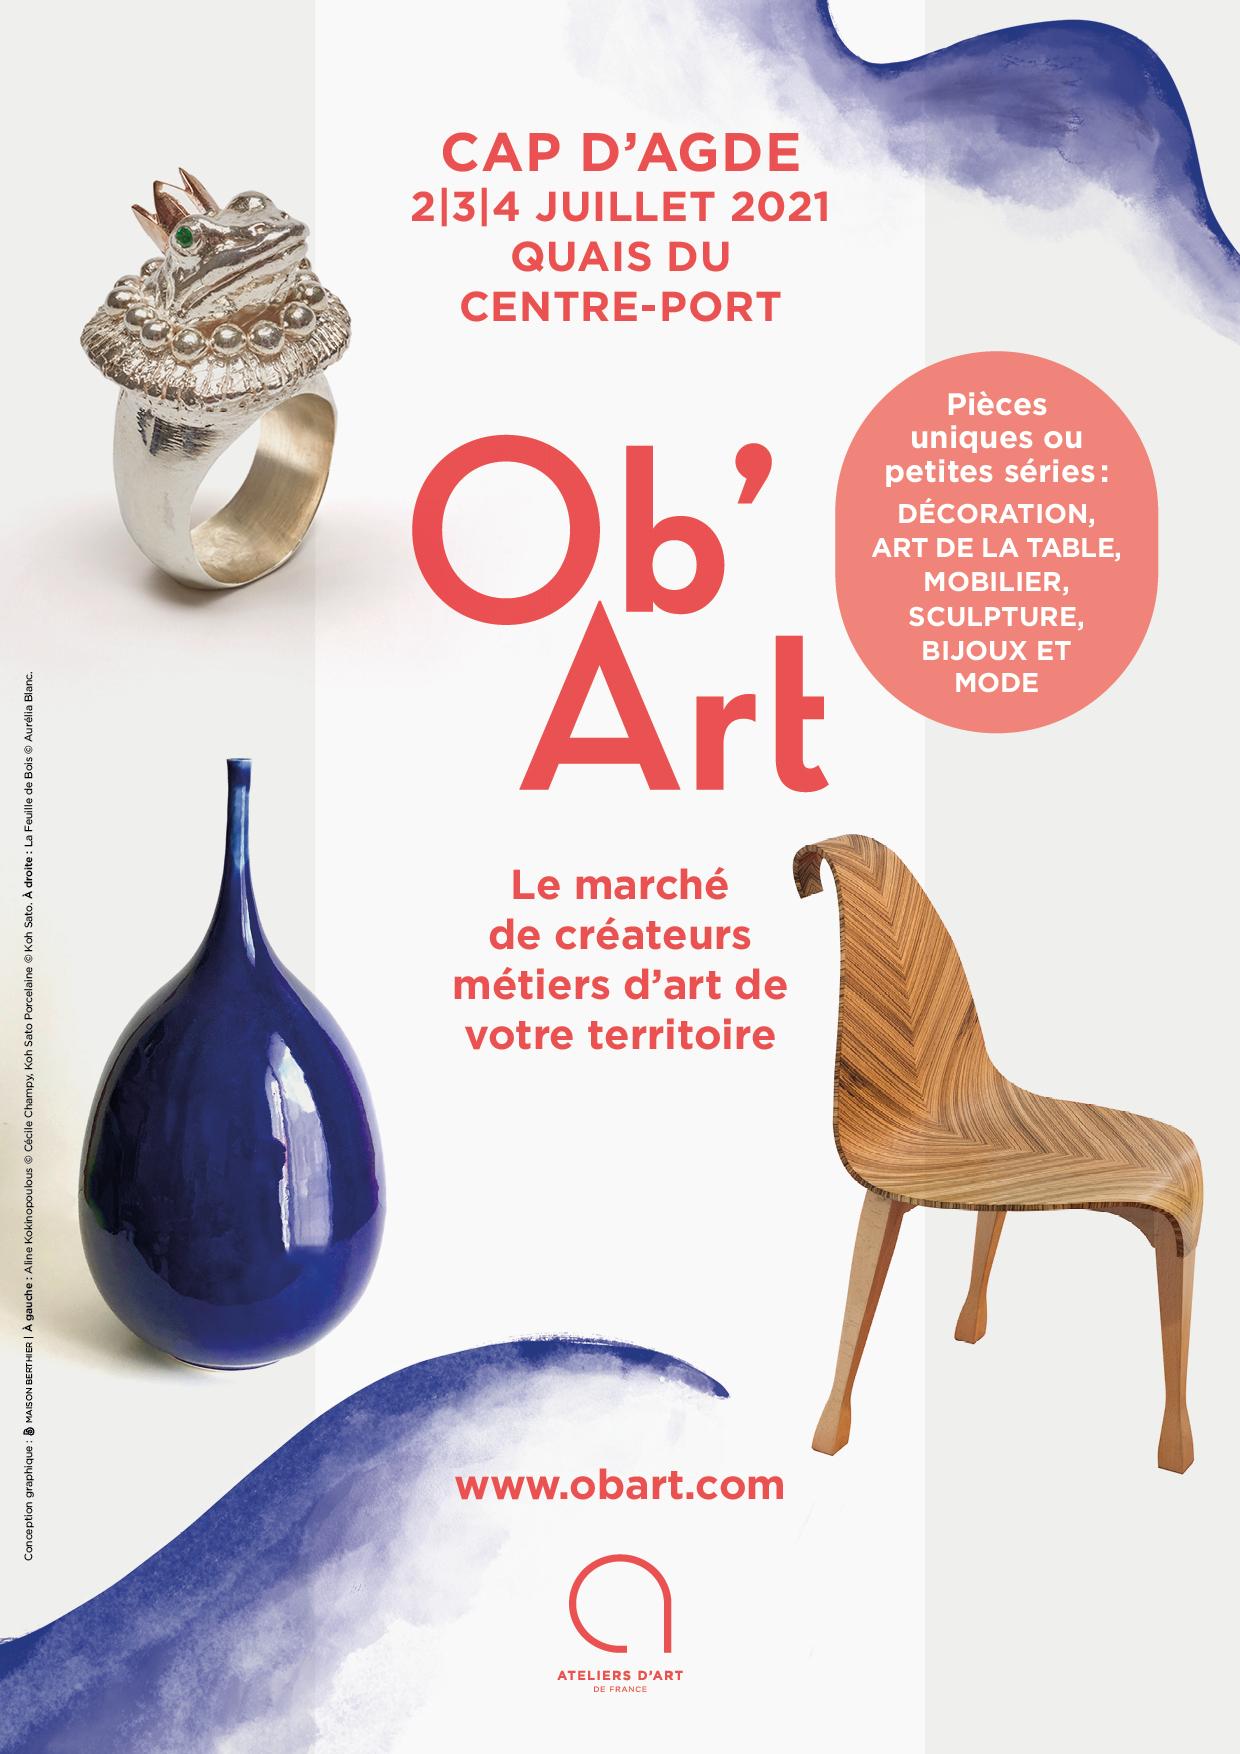 OB'ART CAP D'AGDE- Du 2 au 4 juillet 2021